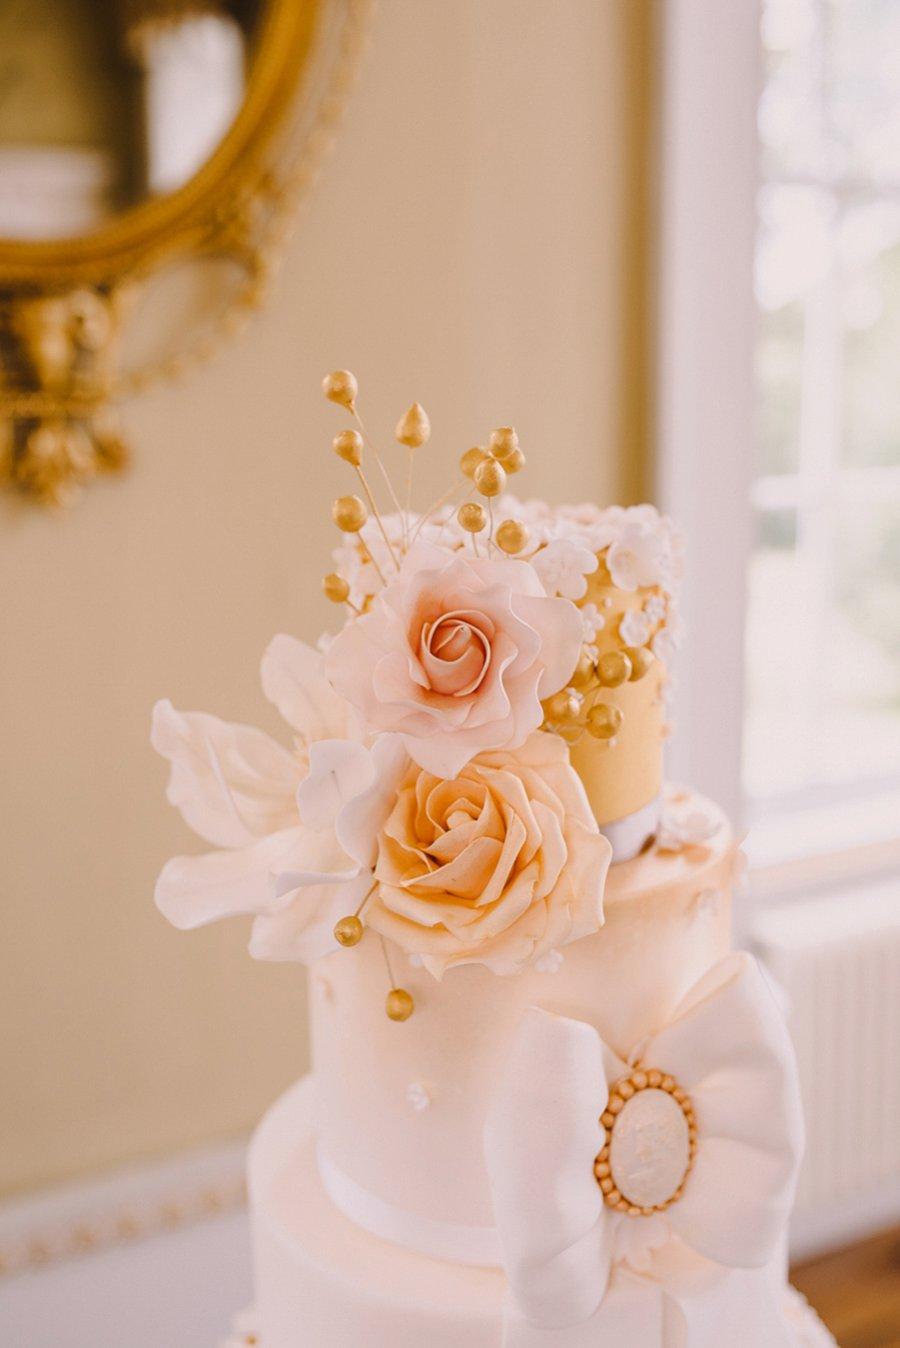 Stylish, Luxe Bridal Shoot With Elegant Tones of Gold, Nude & Marsala! Stylish, Luxe Bridal Shoot With Elegant Tones of Gold, Nude & Marsala!